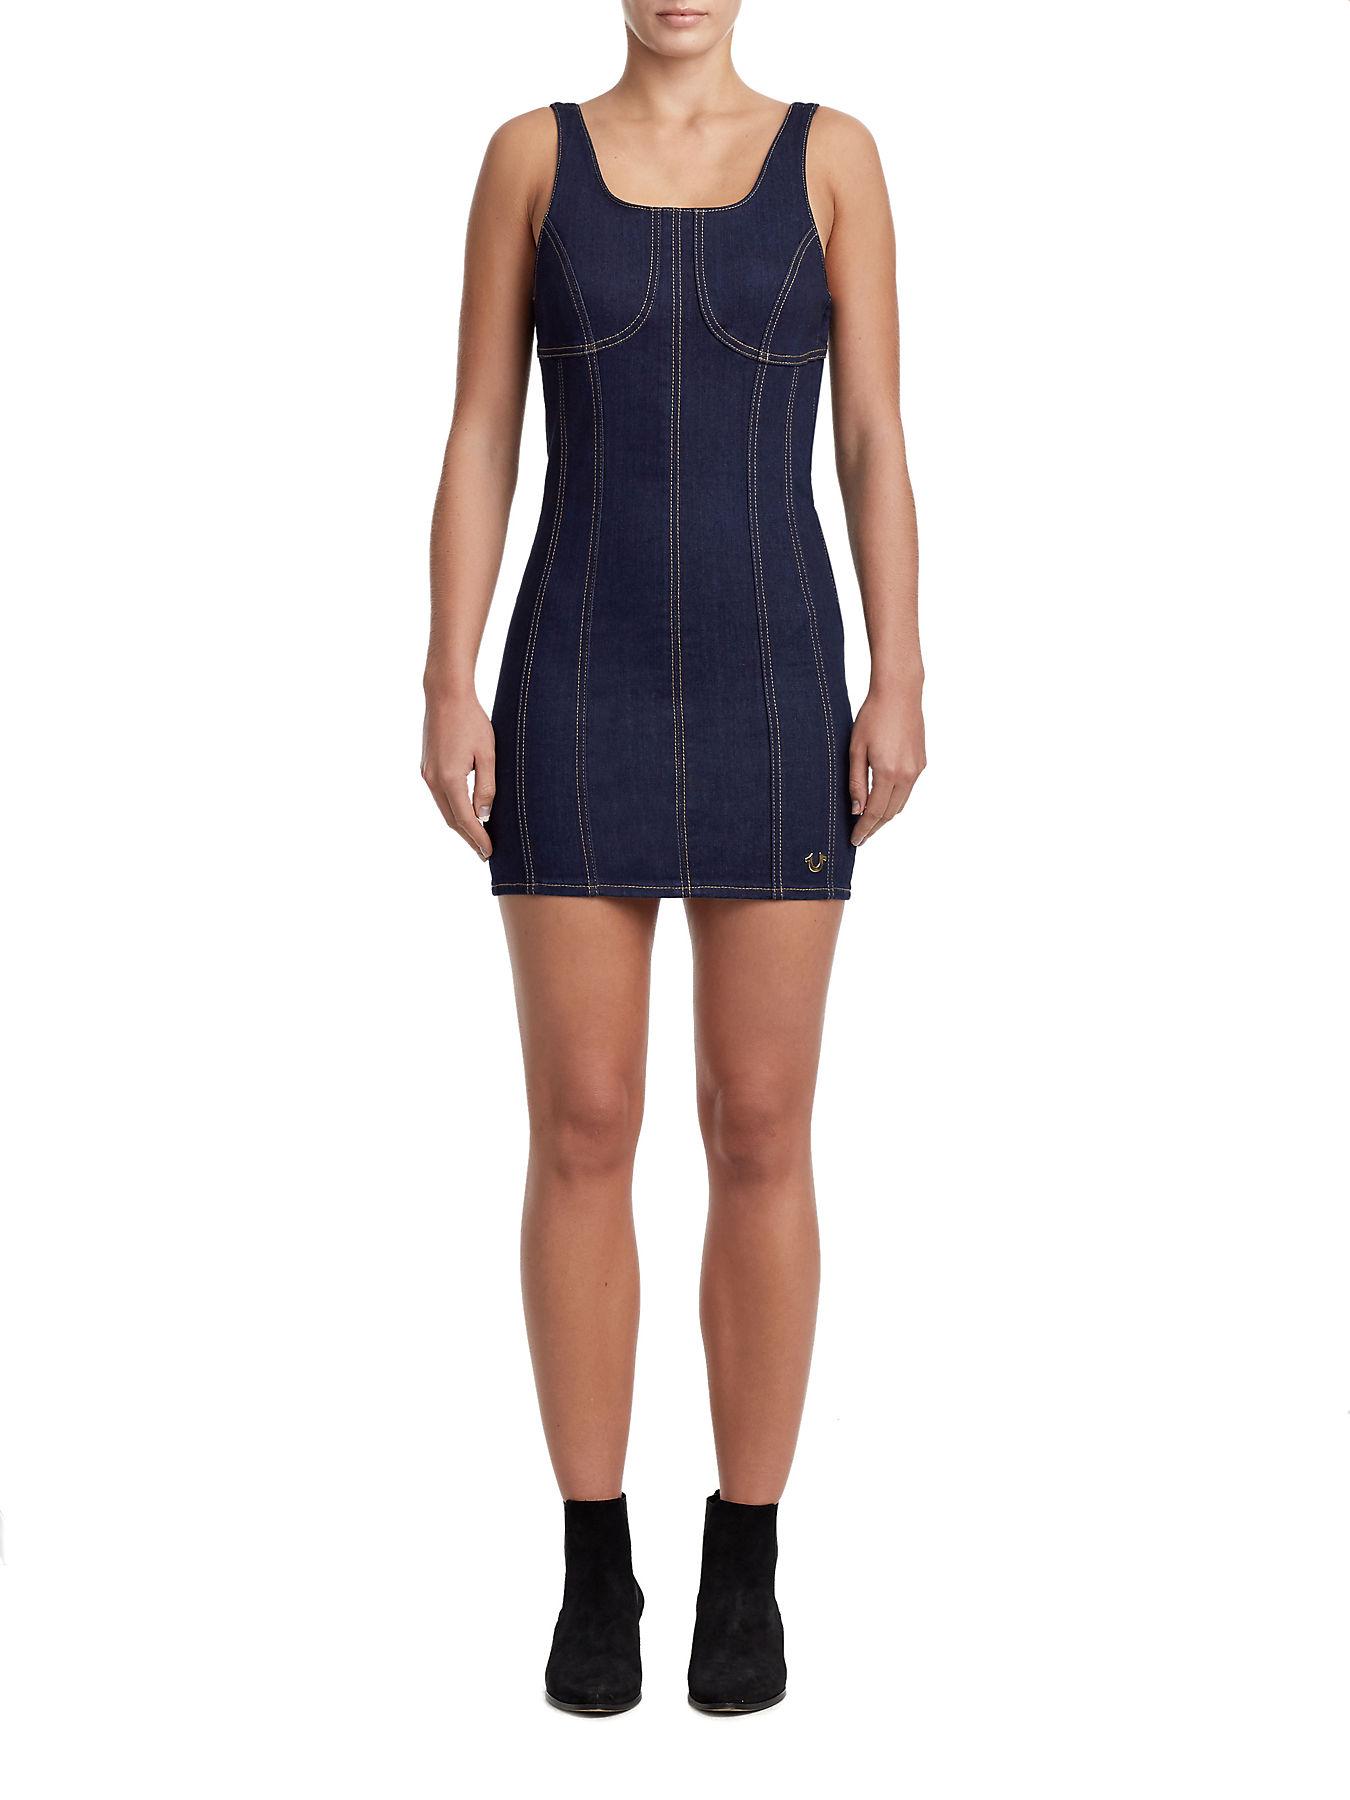 56854f8bff7 WOMENS CORSET DENIM BODYCON DRESS